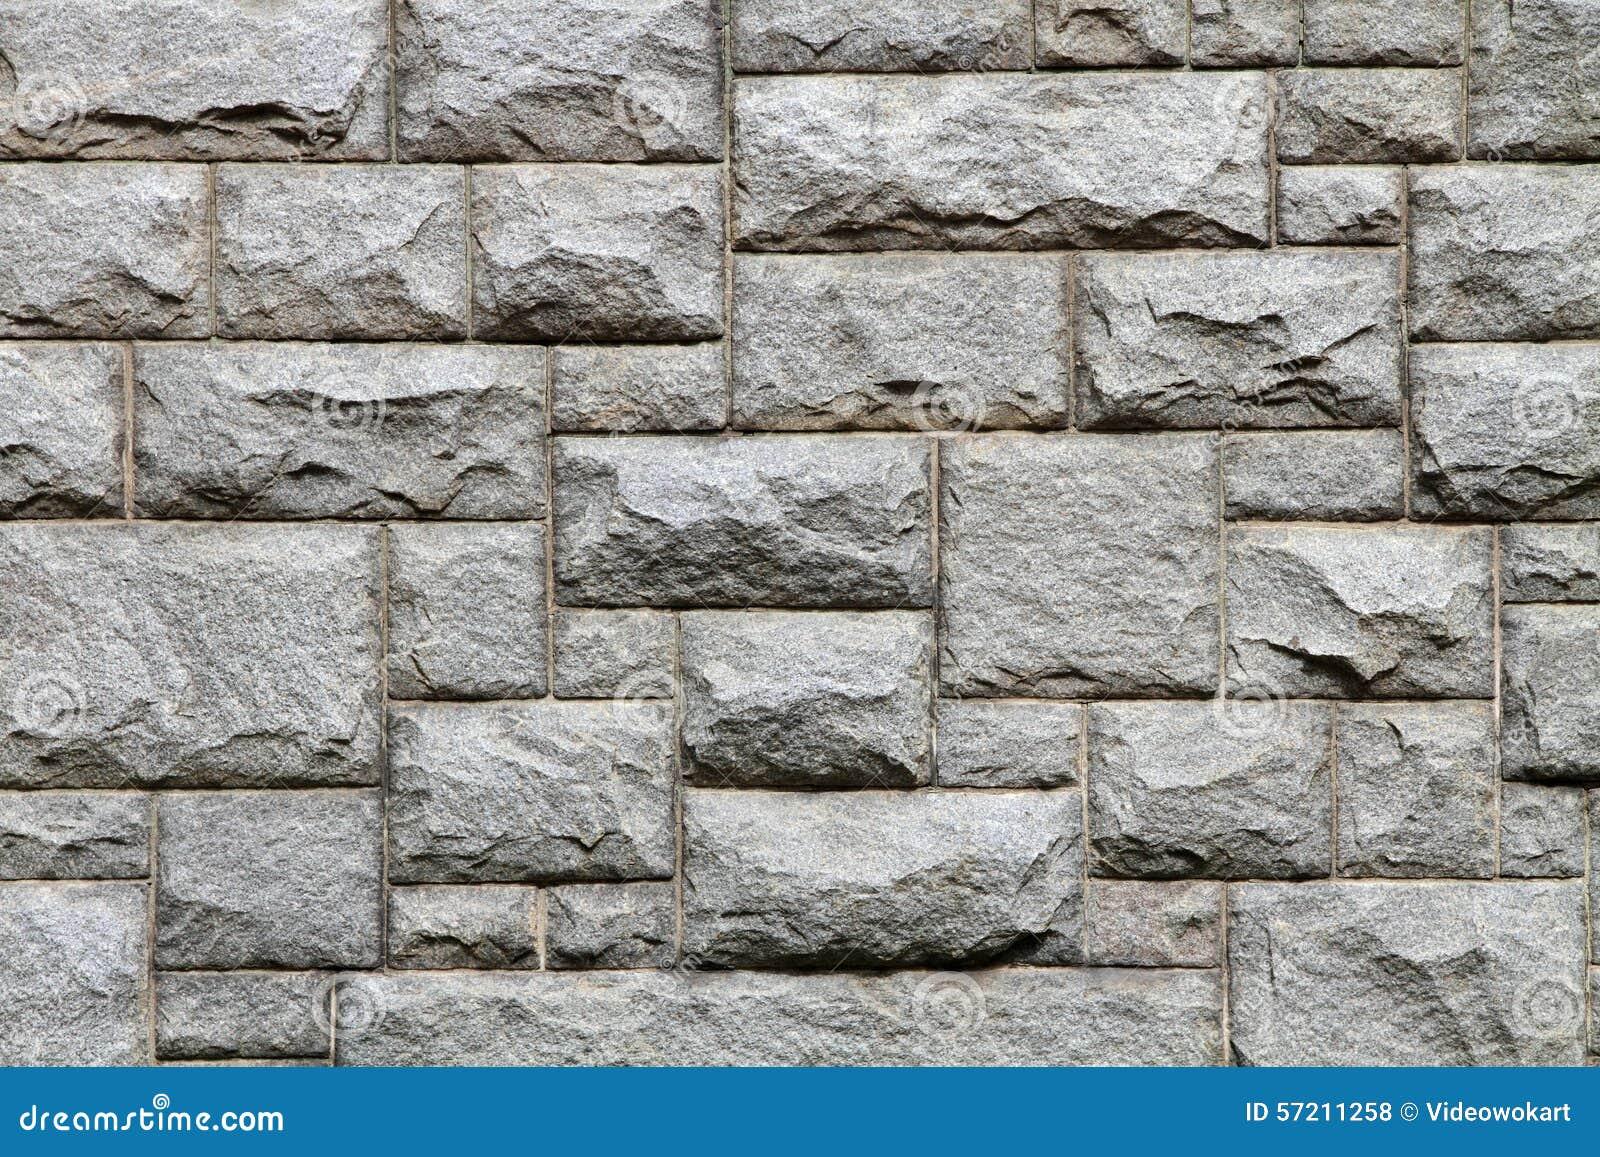 Granite Brick Wall Texture And Background Stock Photo